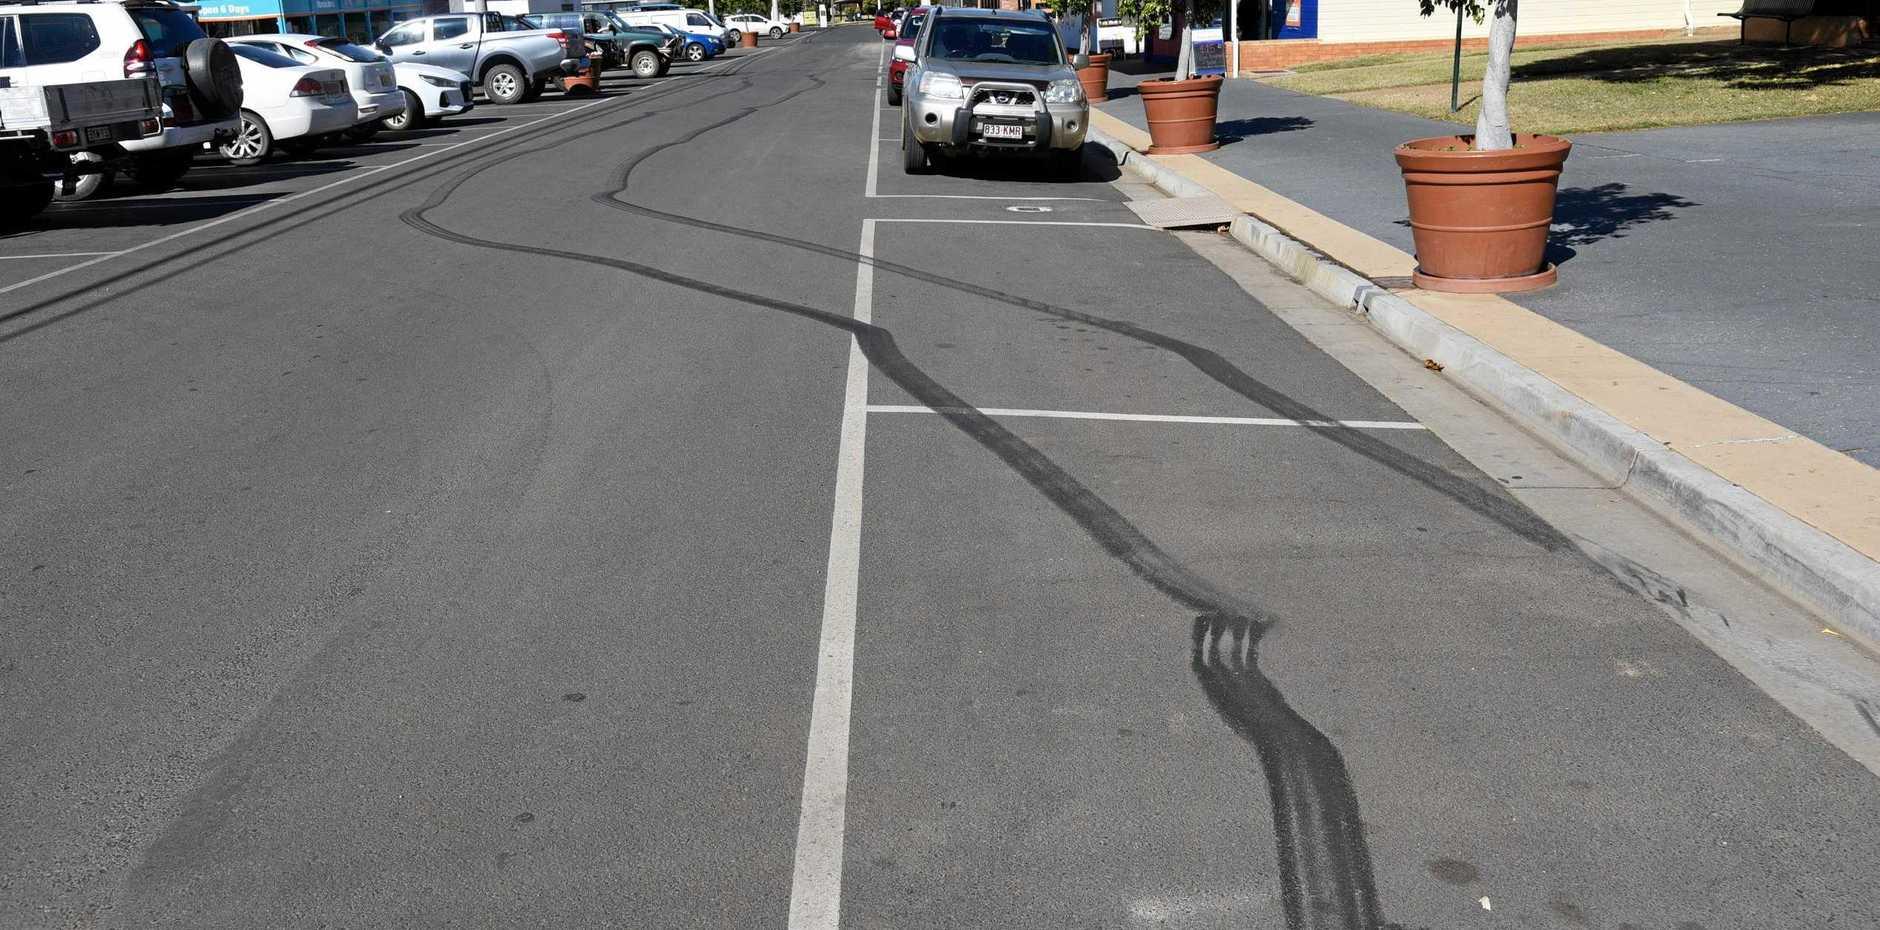 BURNT RUBBER: Tyre marks on Lyons St, Mundubbera, following hooning on Saturday night.